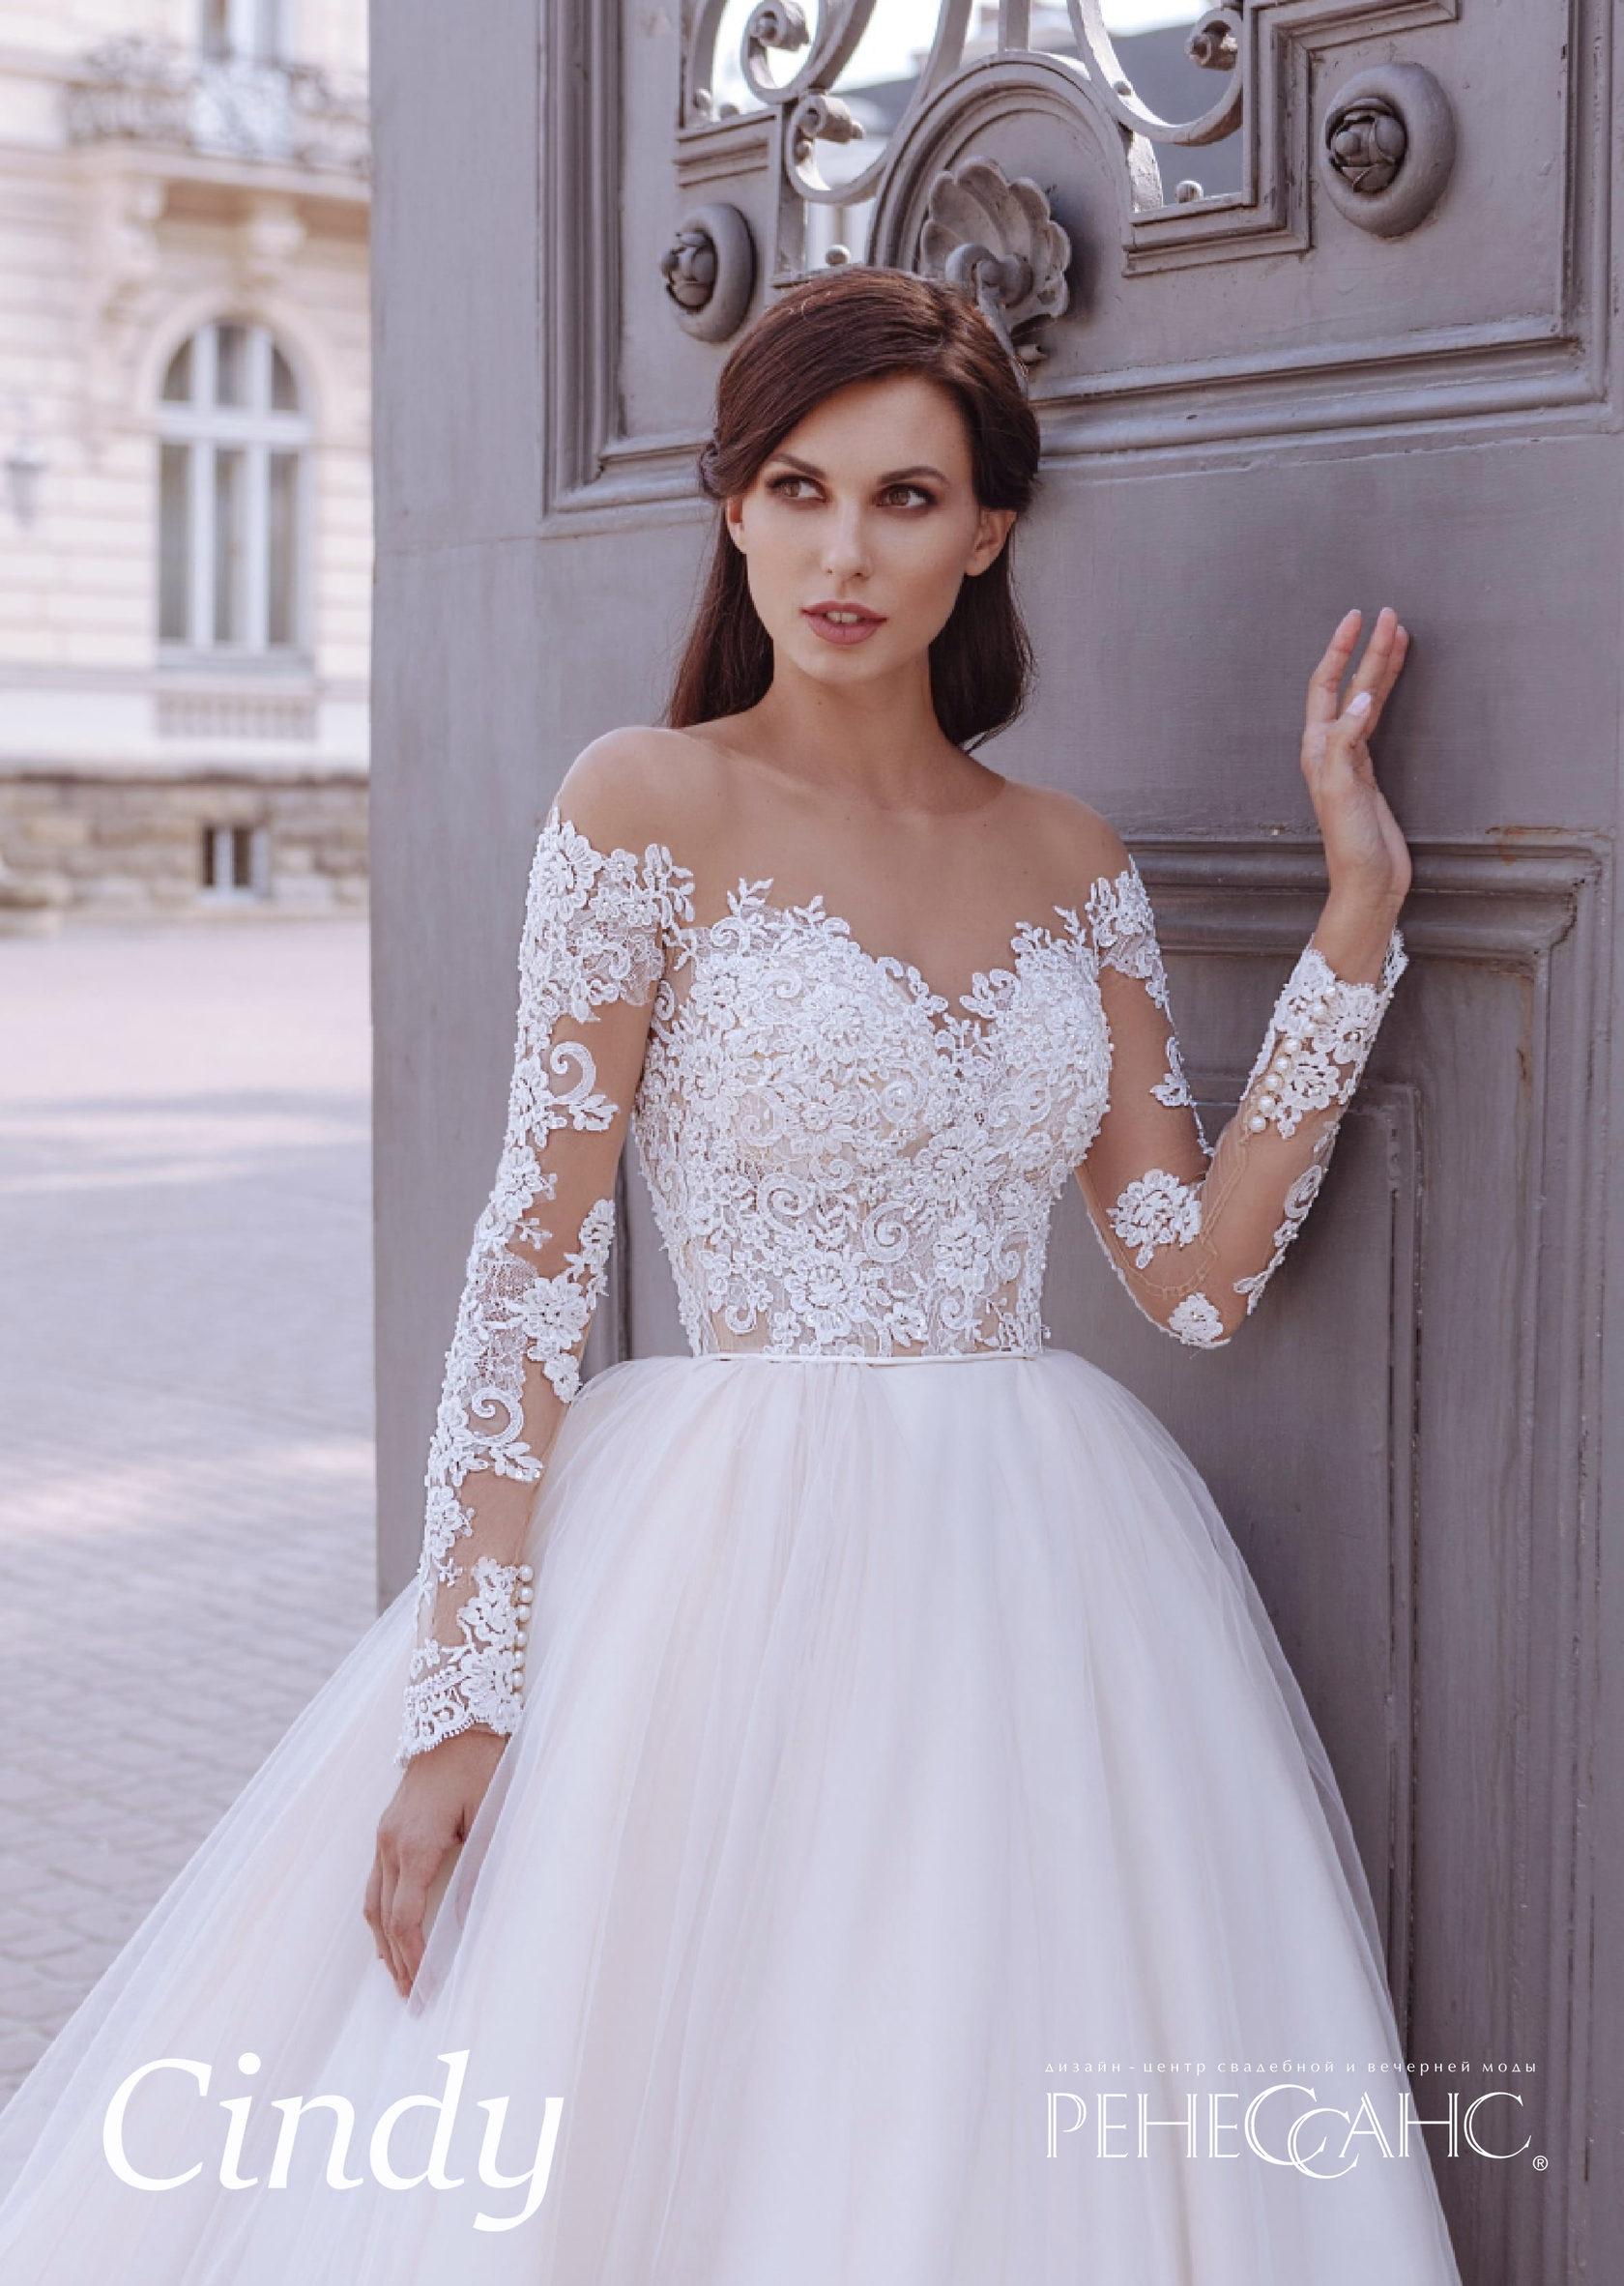 b136c326db9 3 фото. Cindy - Brand Royaldi. Пышное свадебное платье ...